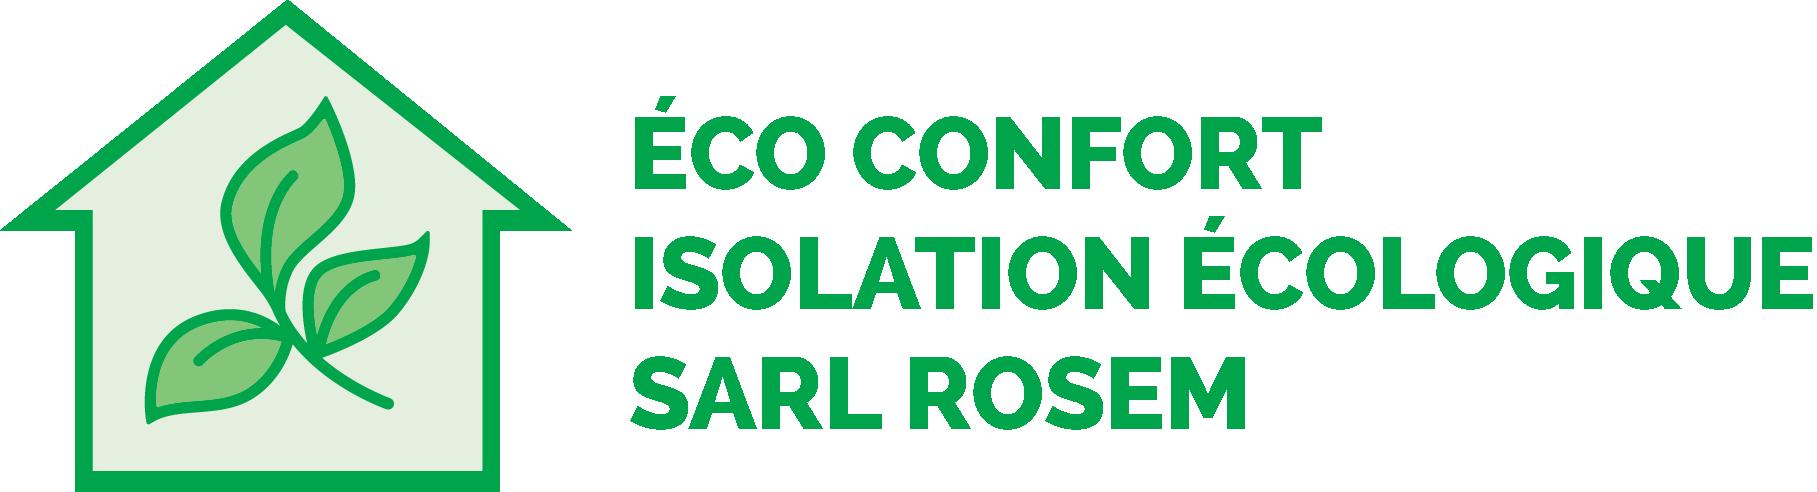 logo-ECIE - sarl ROSEM | Eco Confort - Isolation Ecologique - Melesse